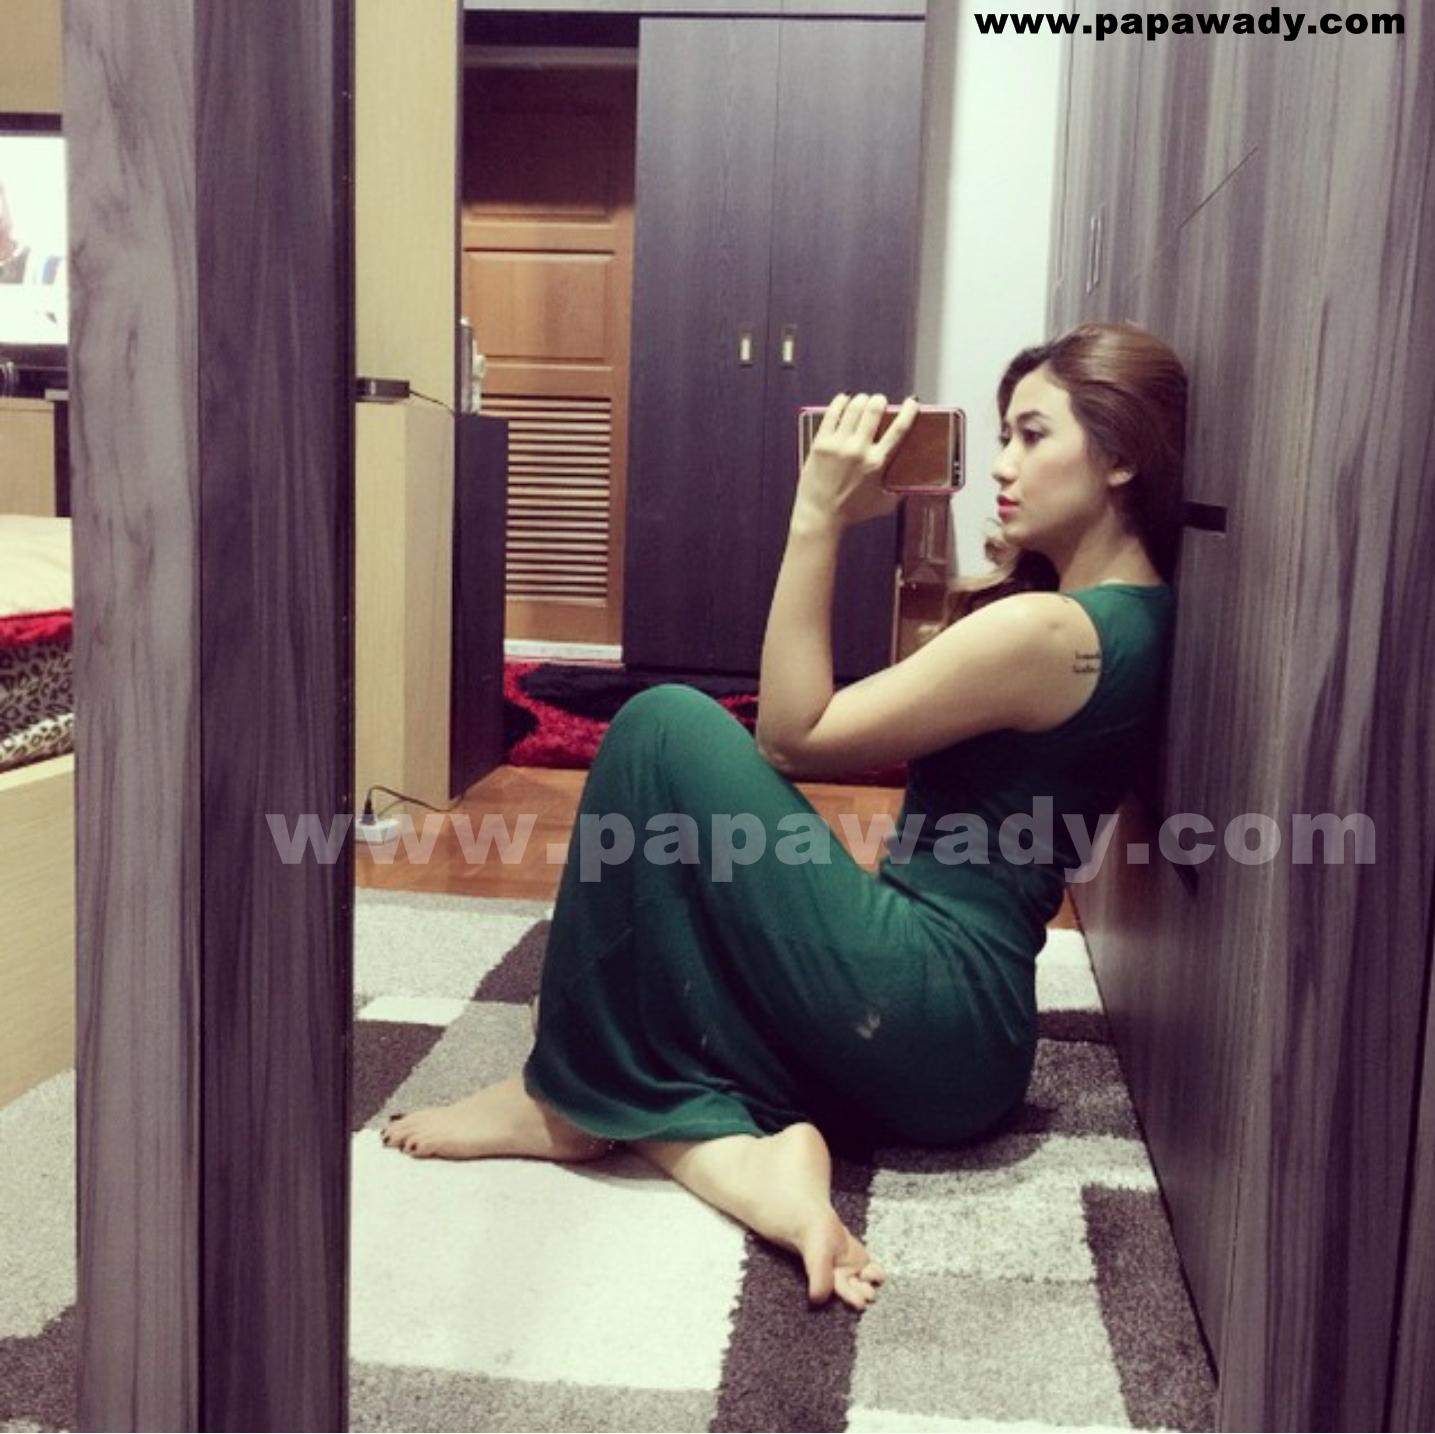 8 Instagram Pictures of Myanmar Model Thinzar Wint Kyaw